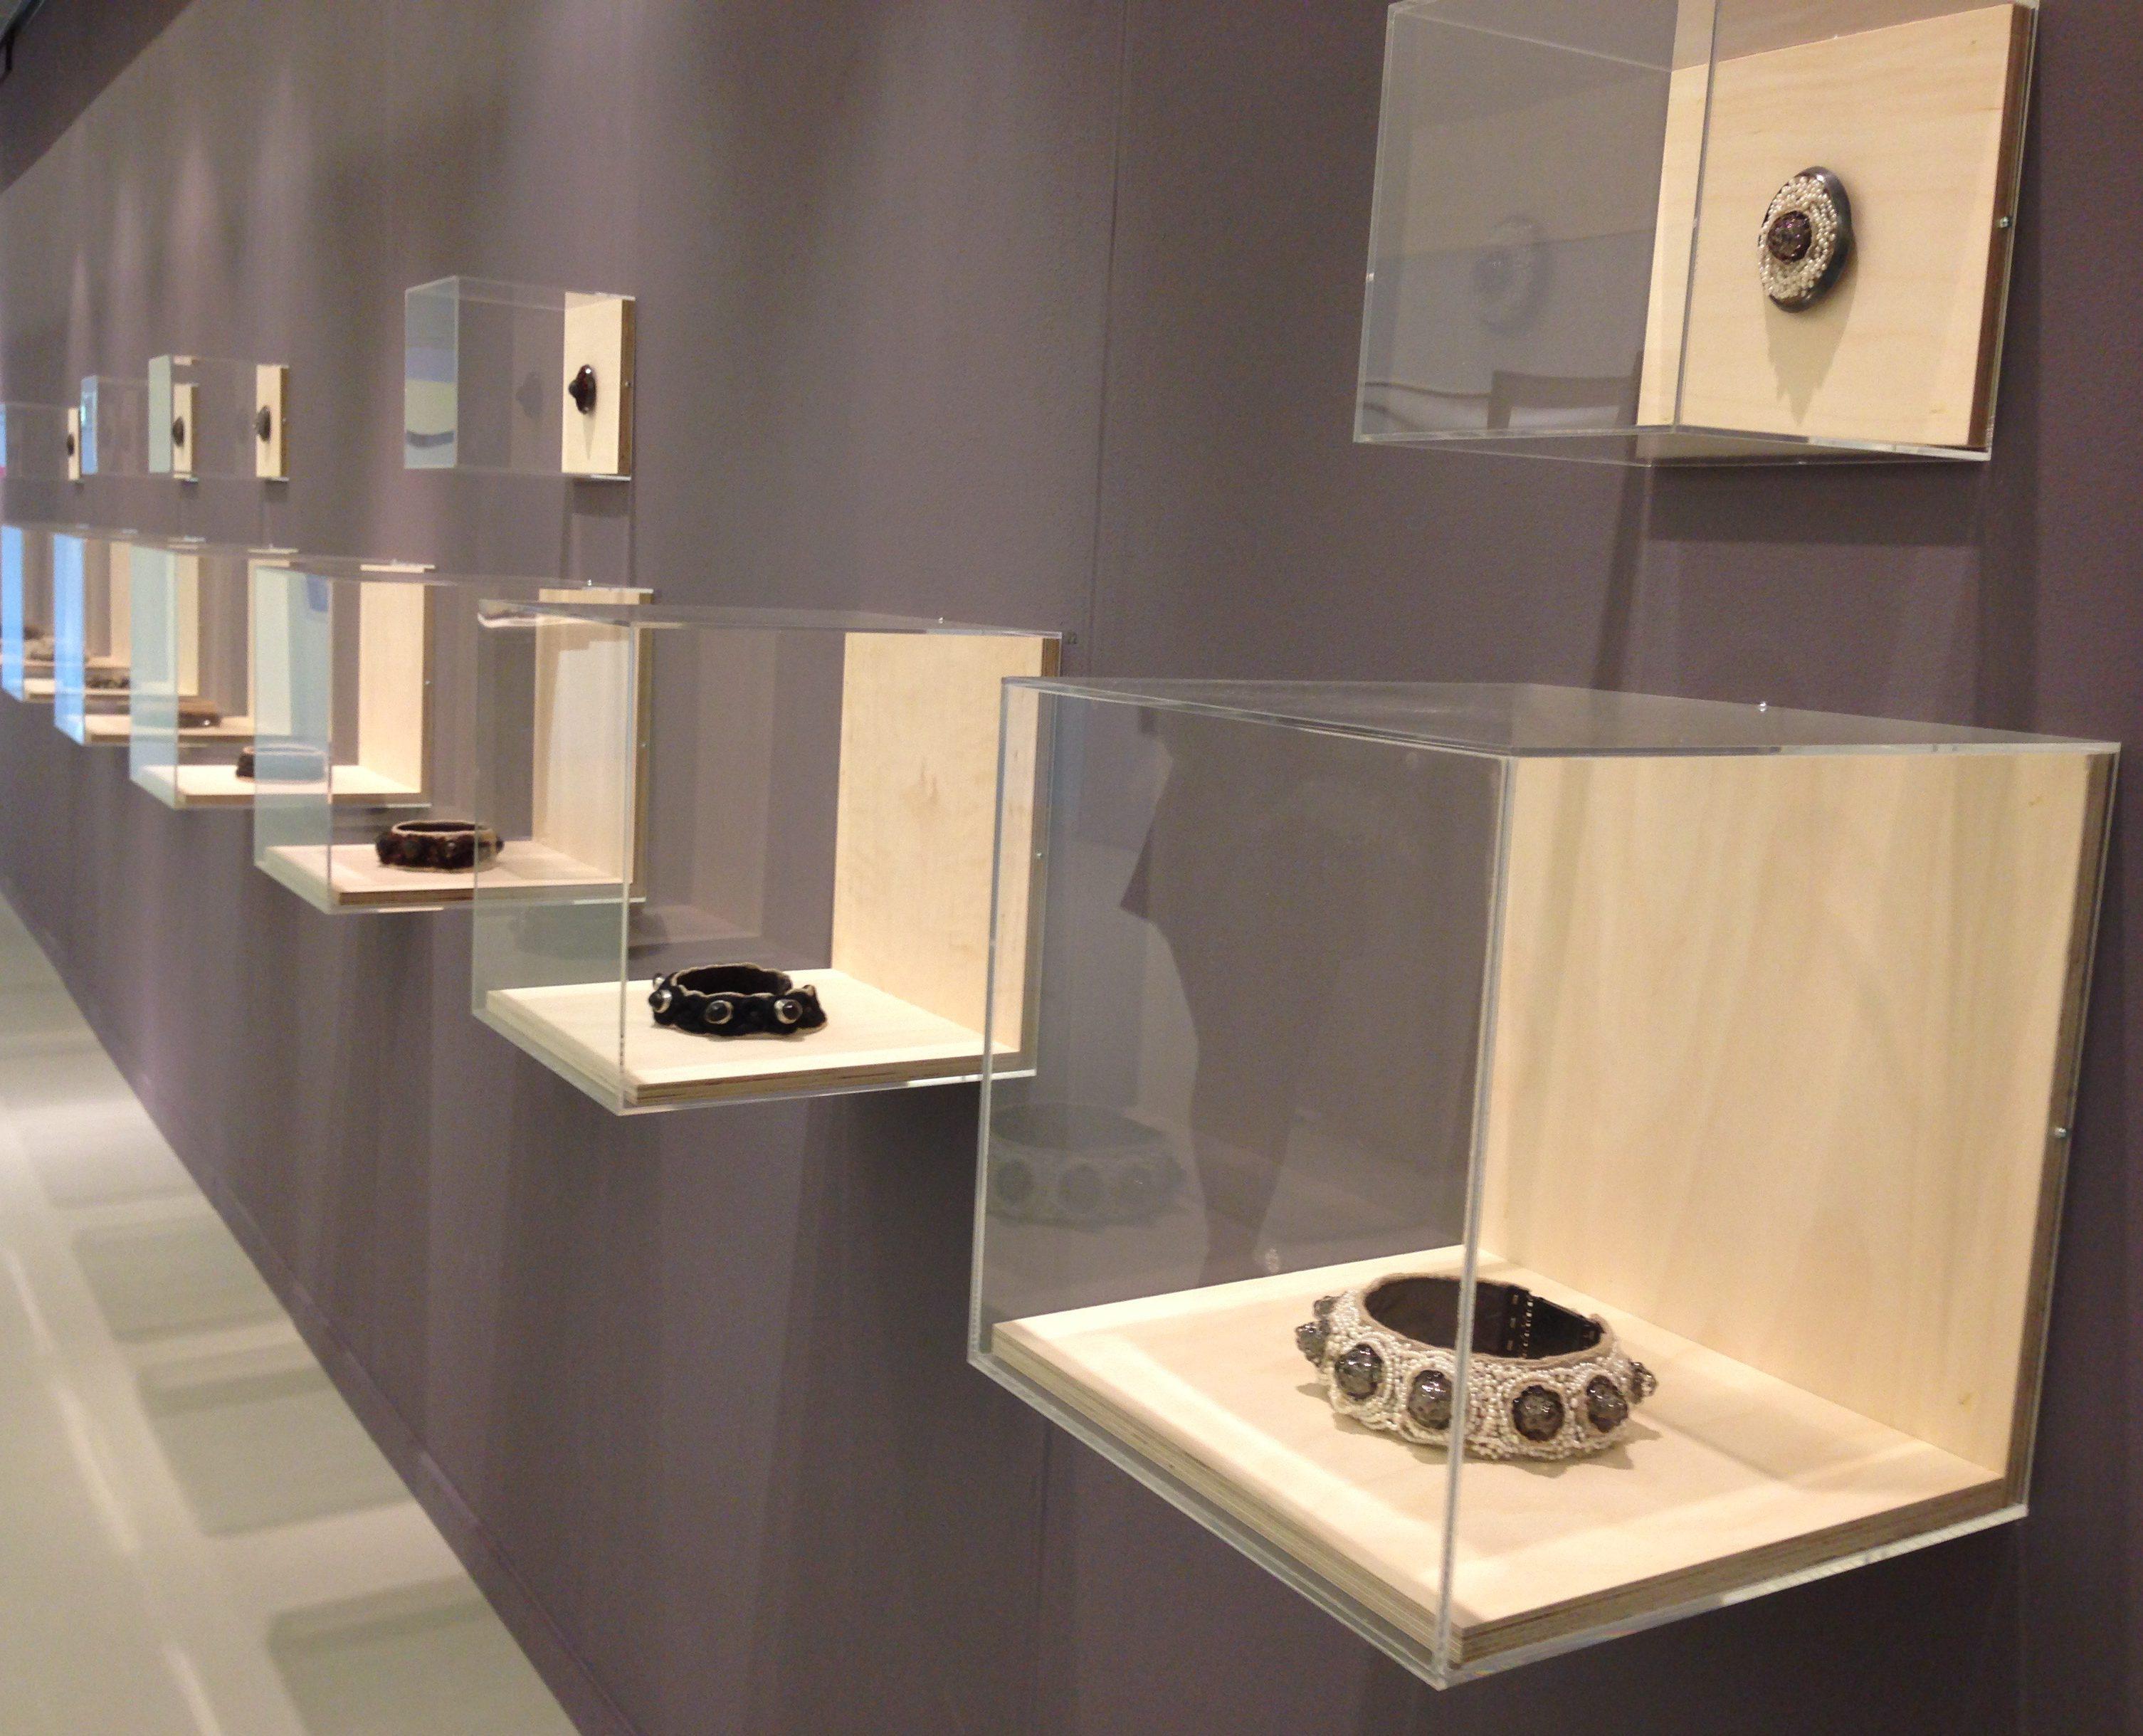 Evert Nijland, Vernieuwd verleden, CODA, 2016, tentoonstelling, vitrines